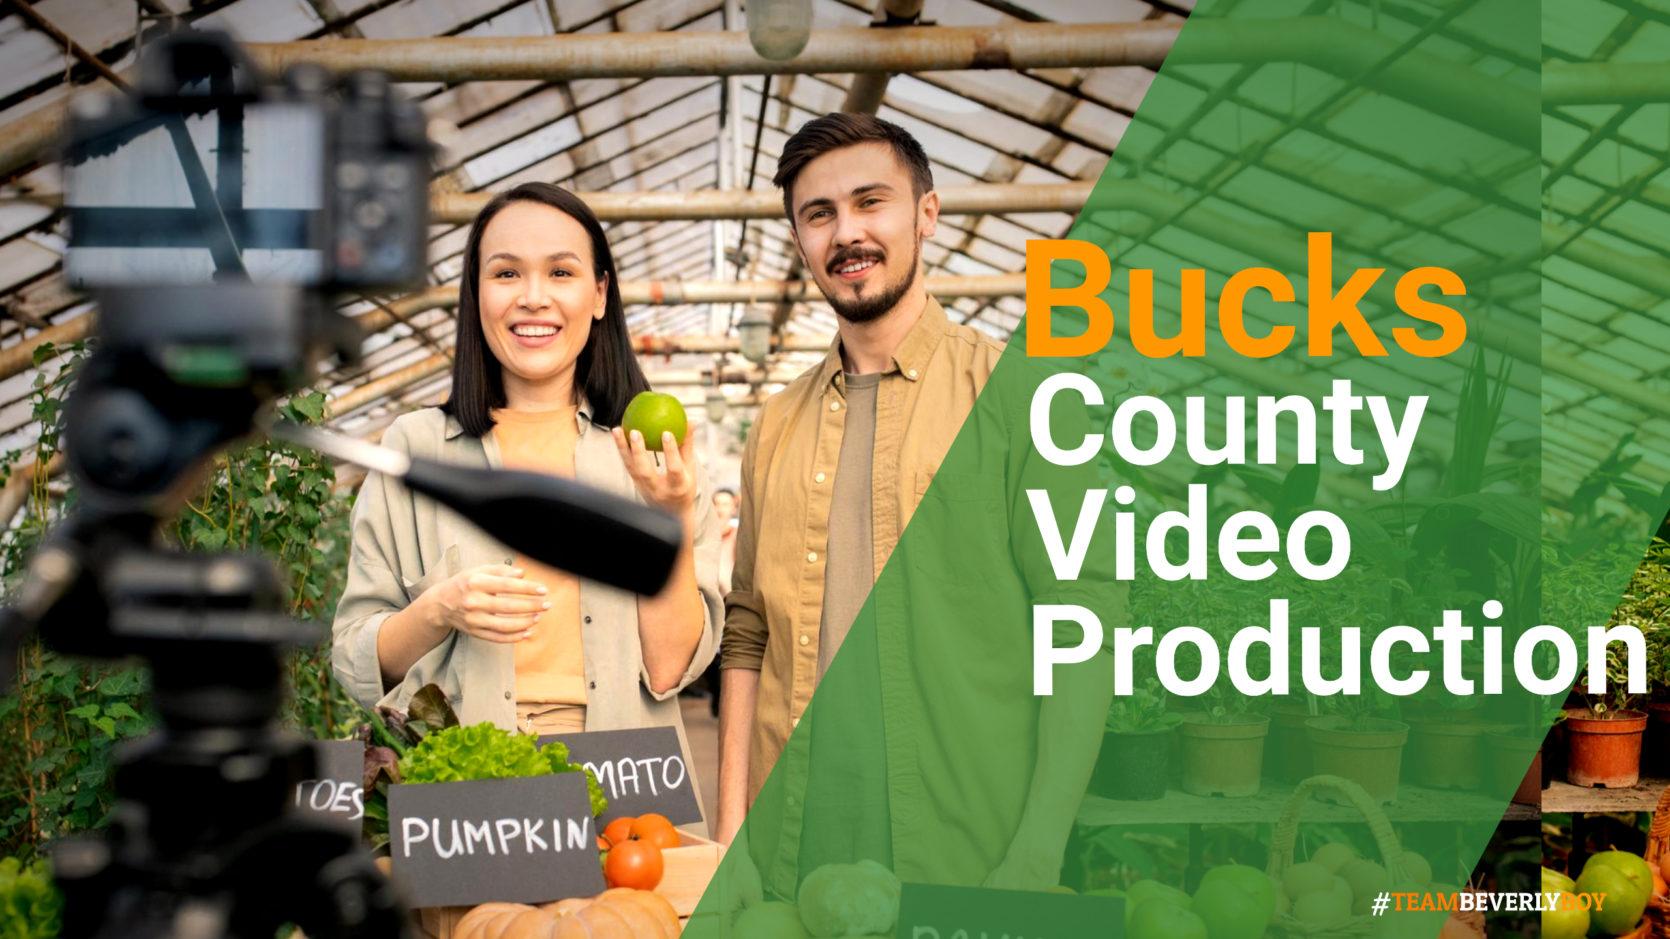 Bucks County Video Production